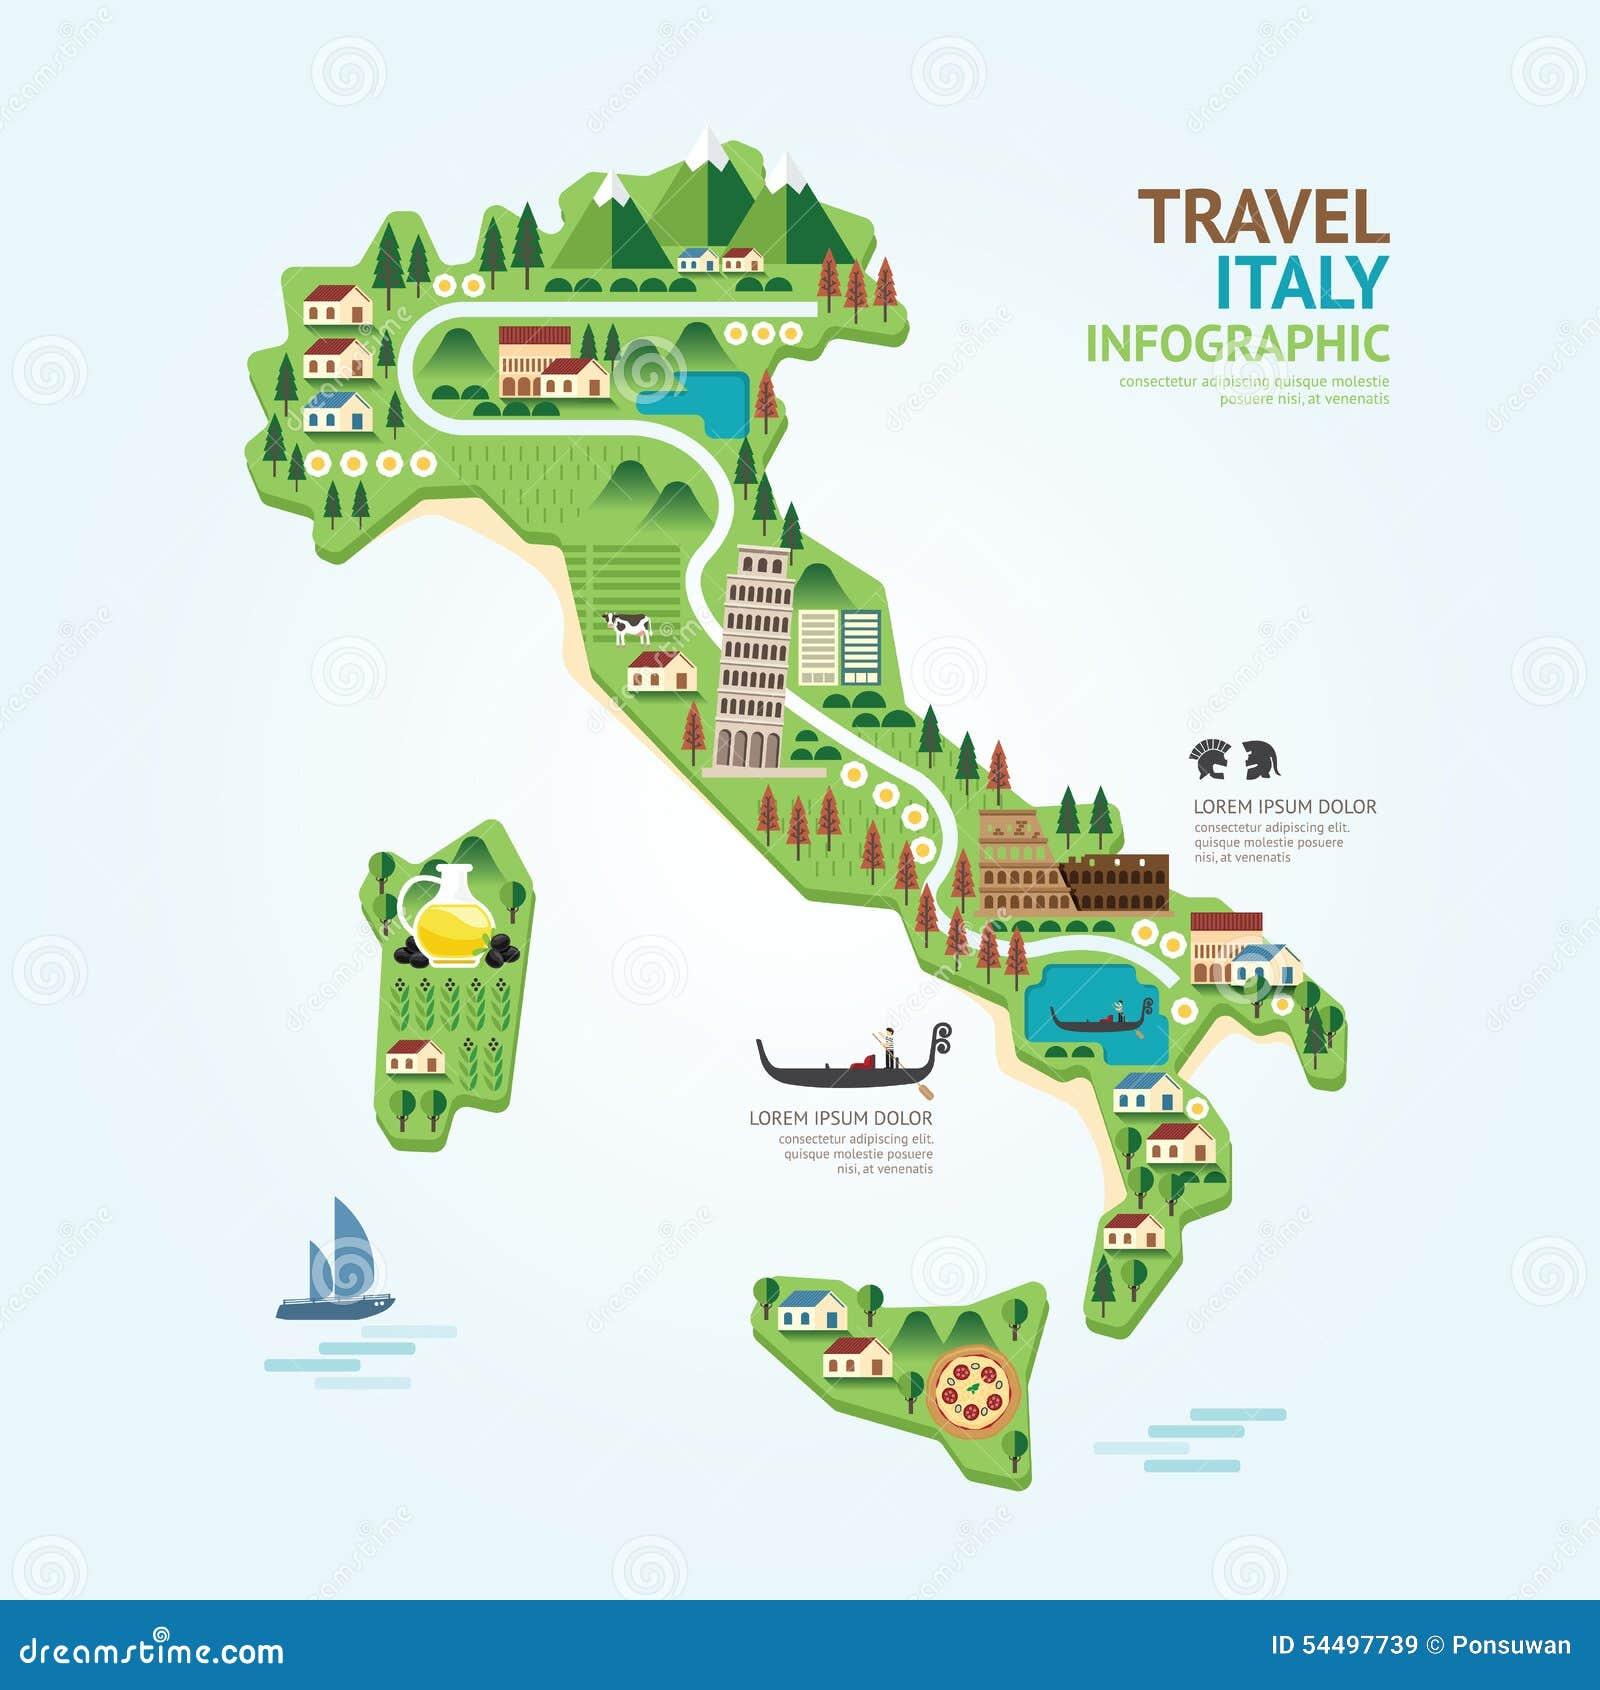 Infographic旅行和地标意大利地图形状模板设计